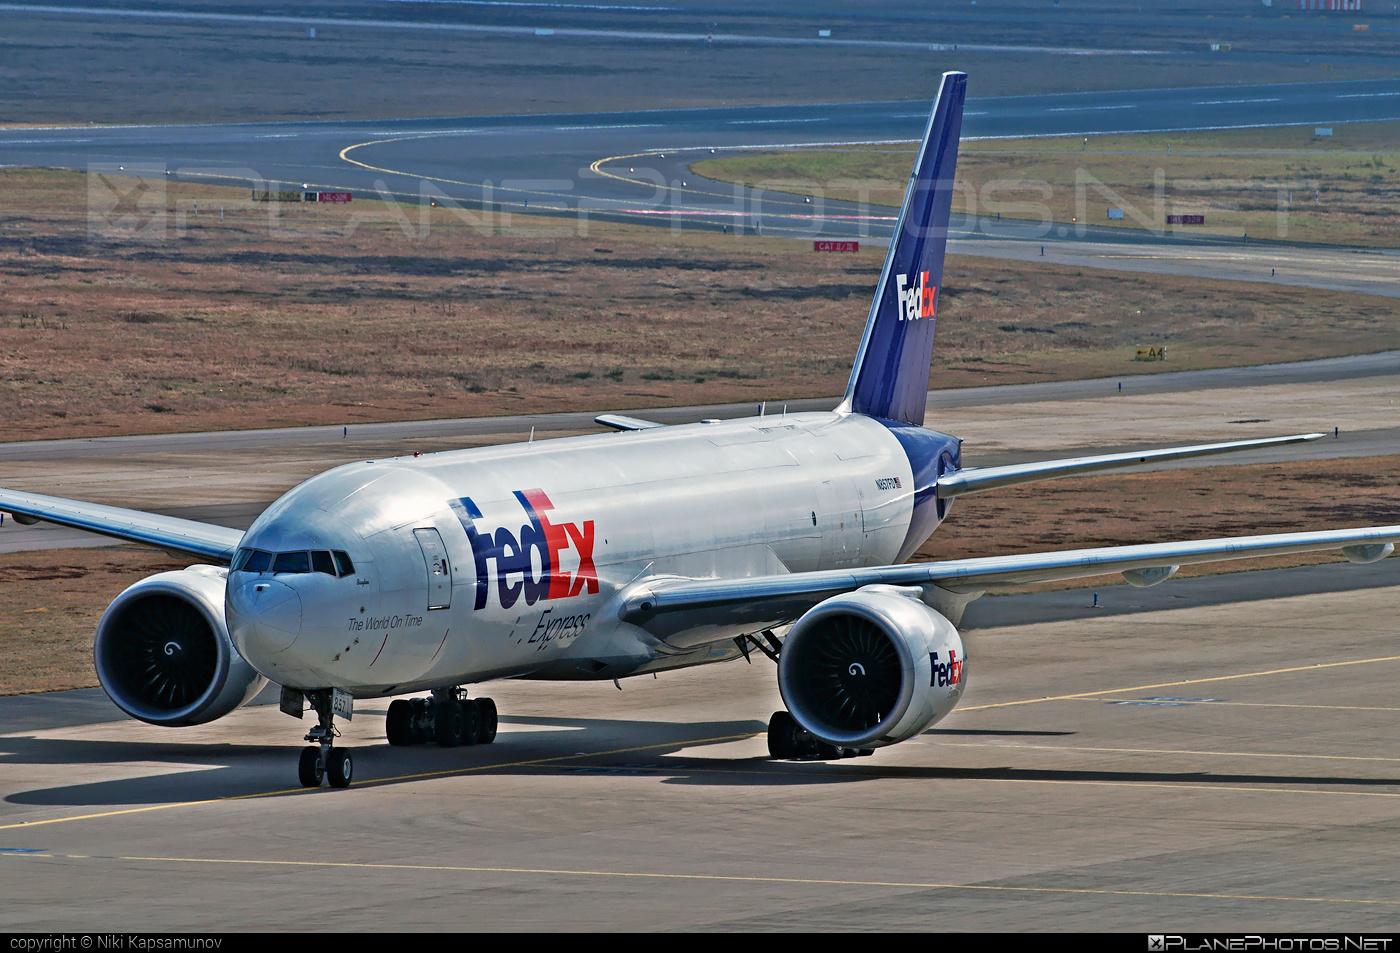 Boeing 777F - N857FD operated by FedEx Express #b777 #b777f #b777freighter #boeing #boeing777 #fedex #fedexairlines #fedexexpress #tripleseven